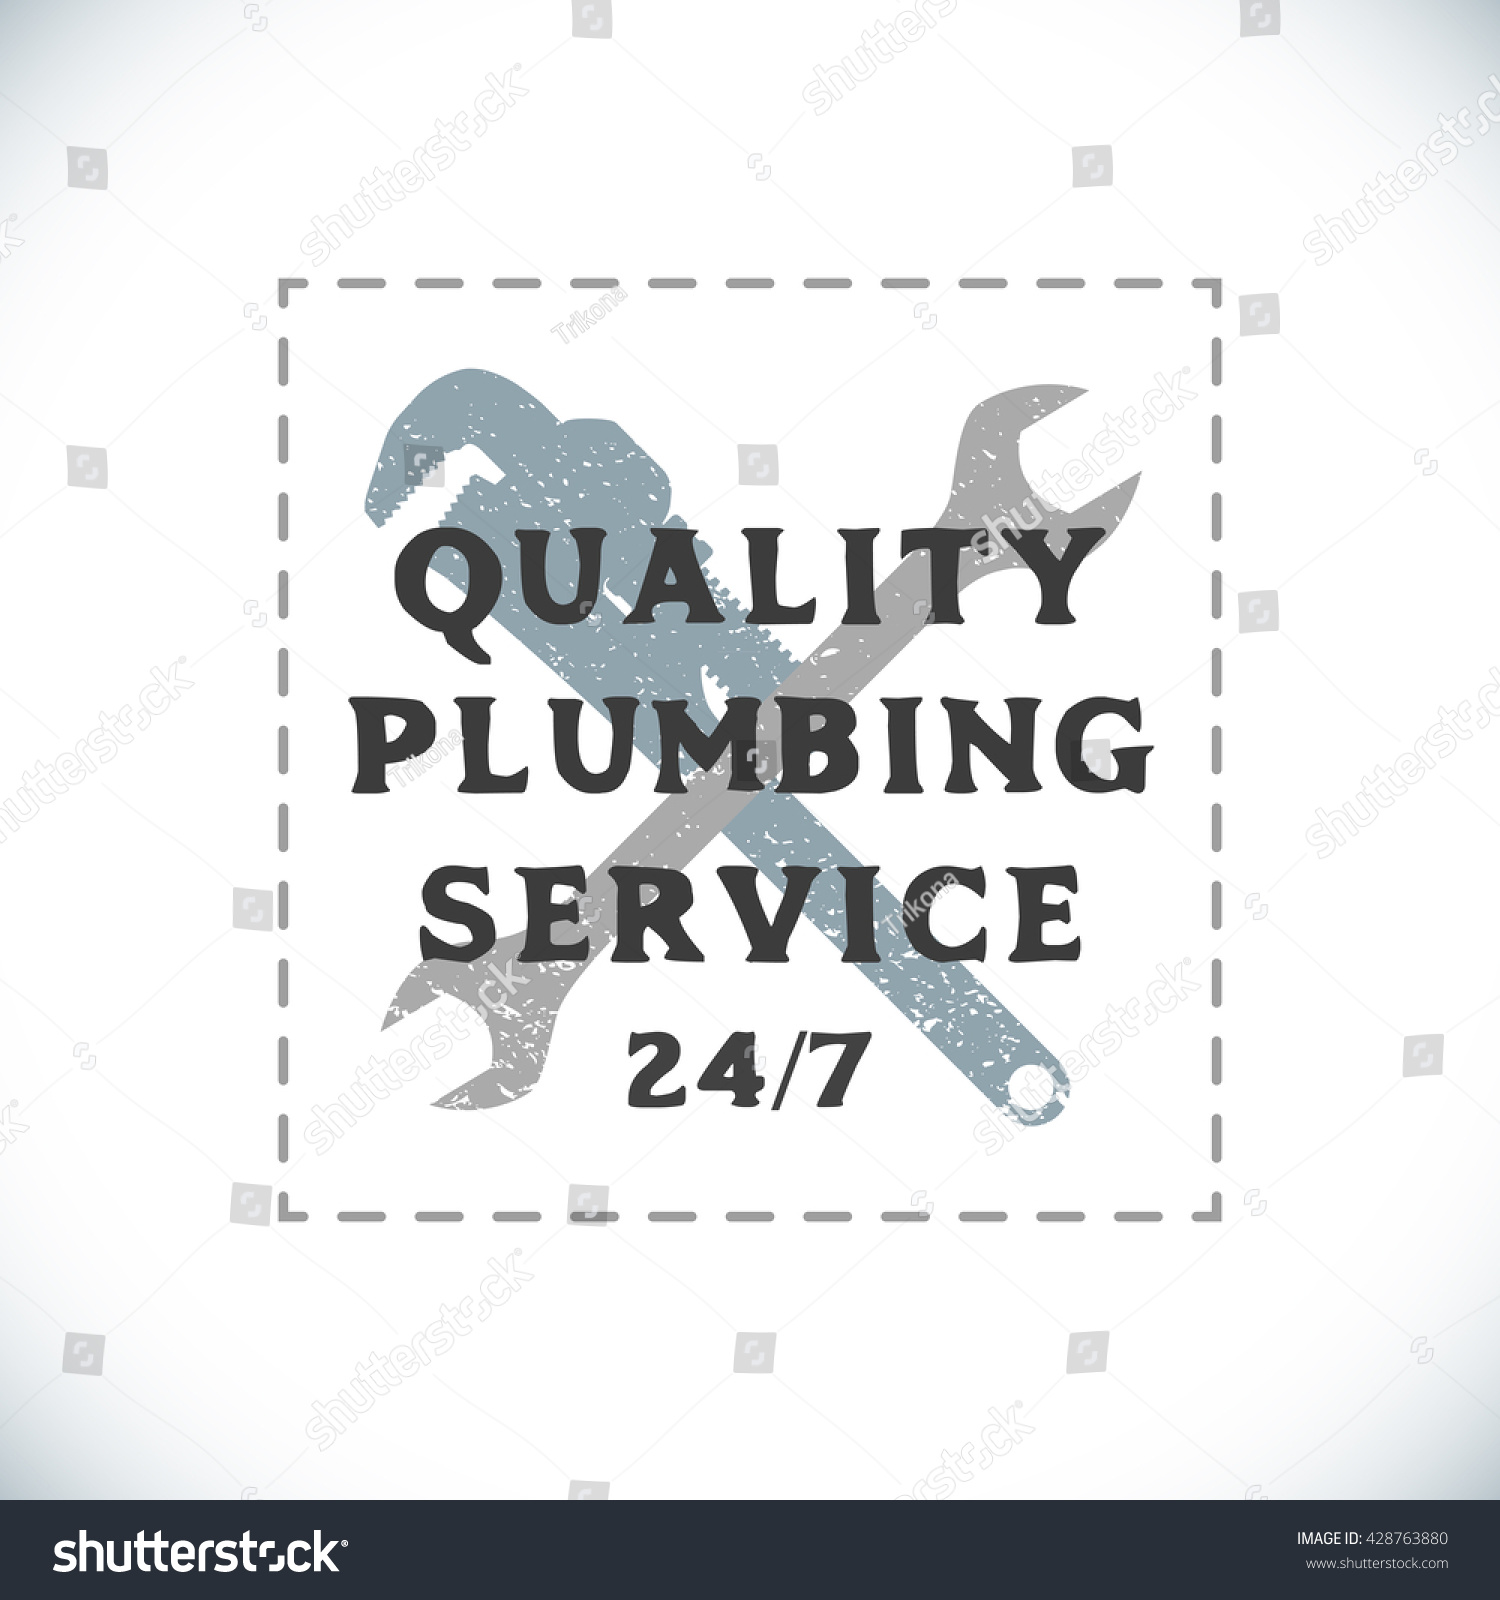 Cute Vintage Plumbing Supply Images - Bathroom with Bathtub Ideas ...